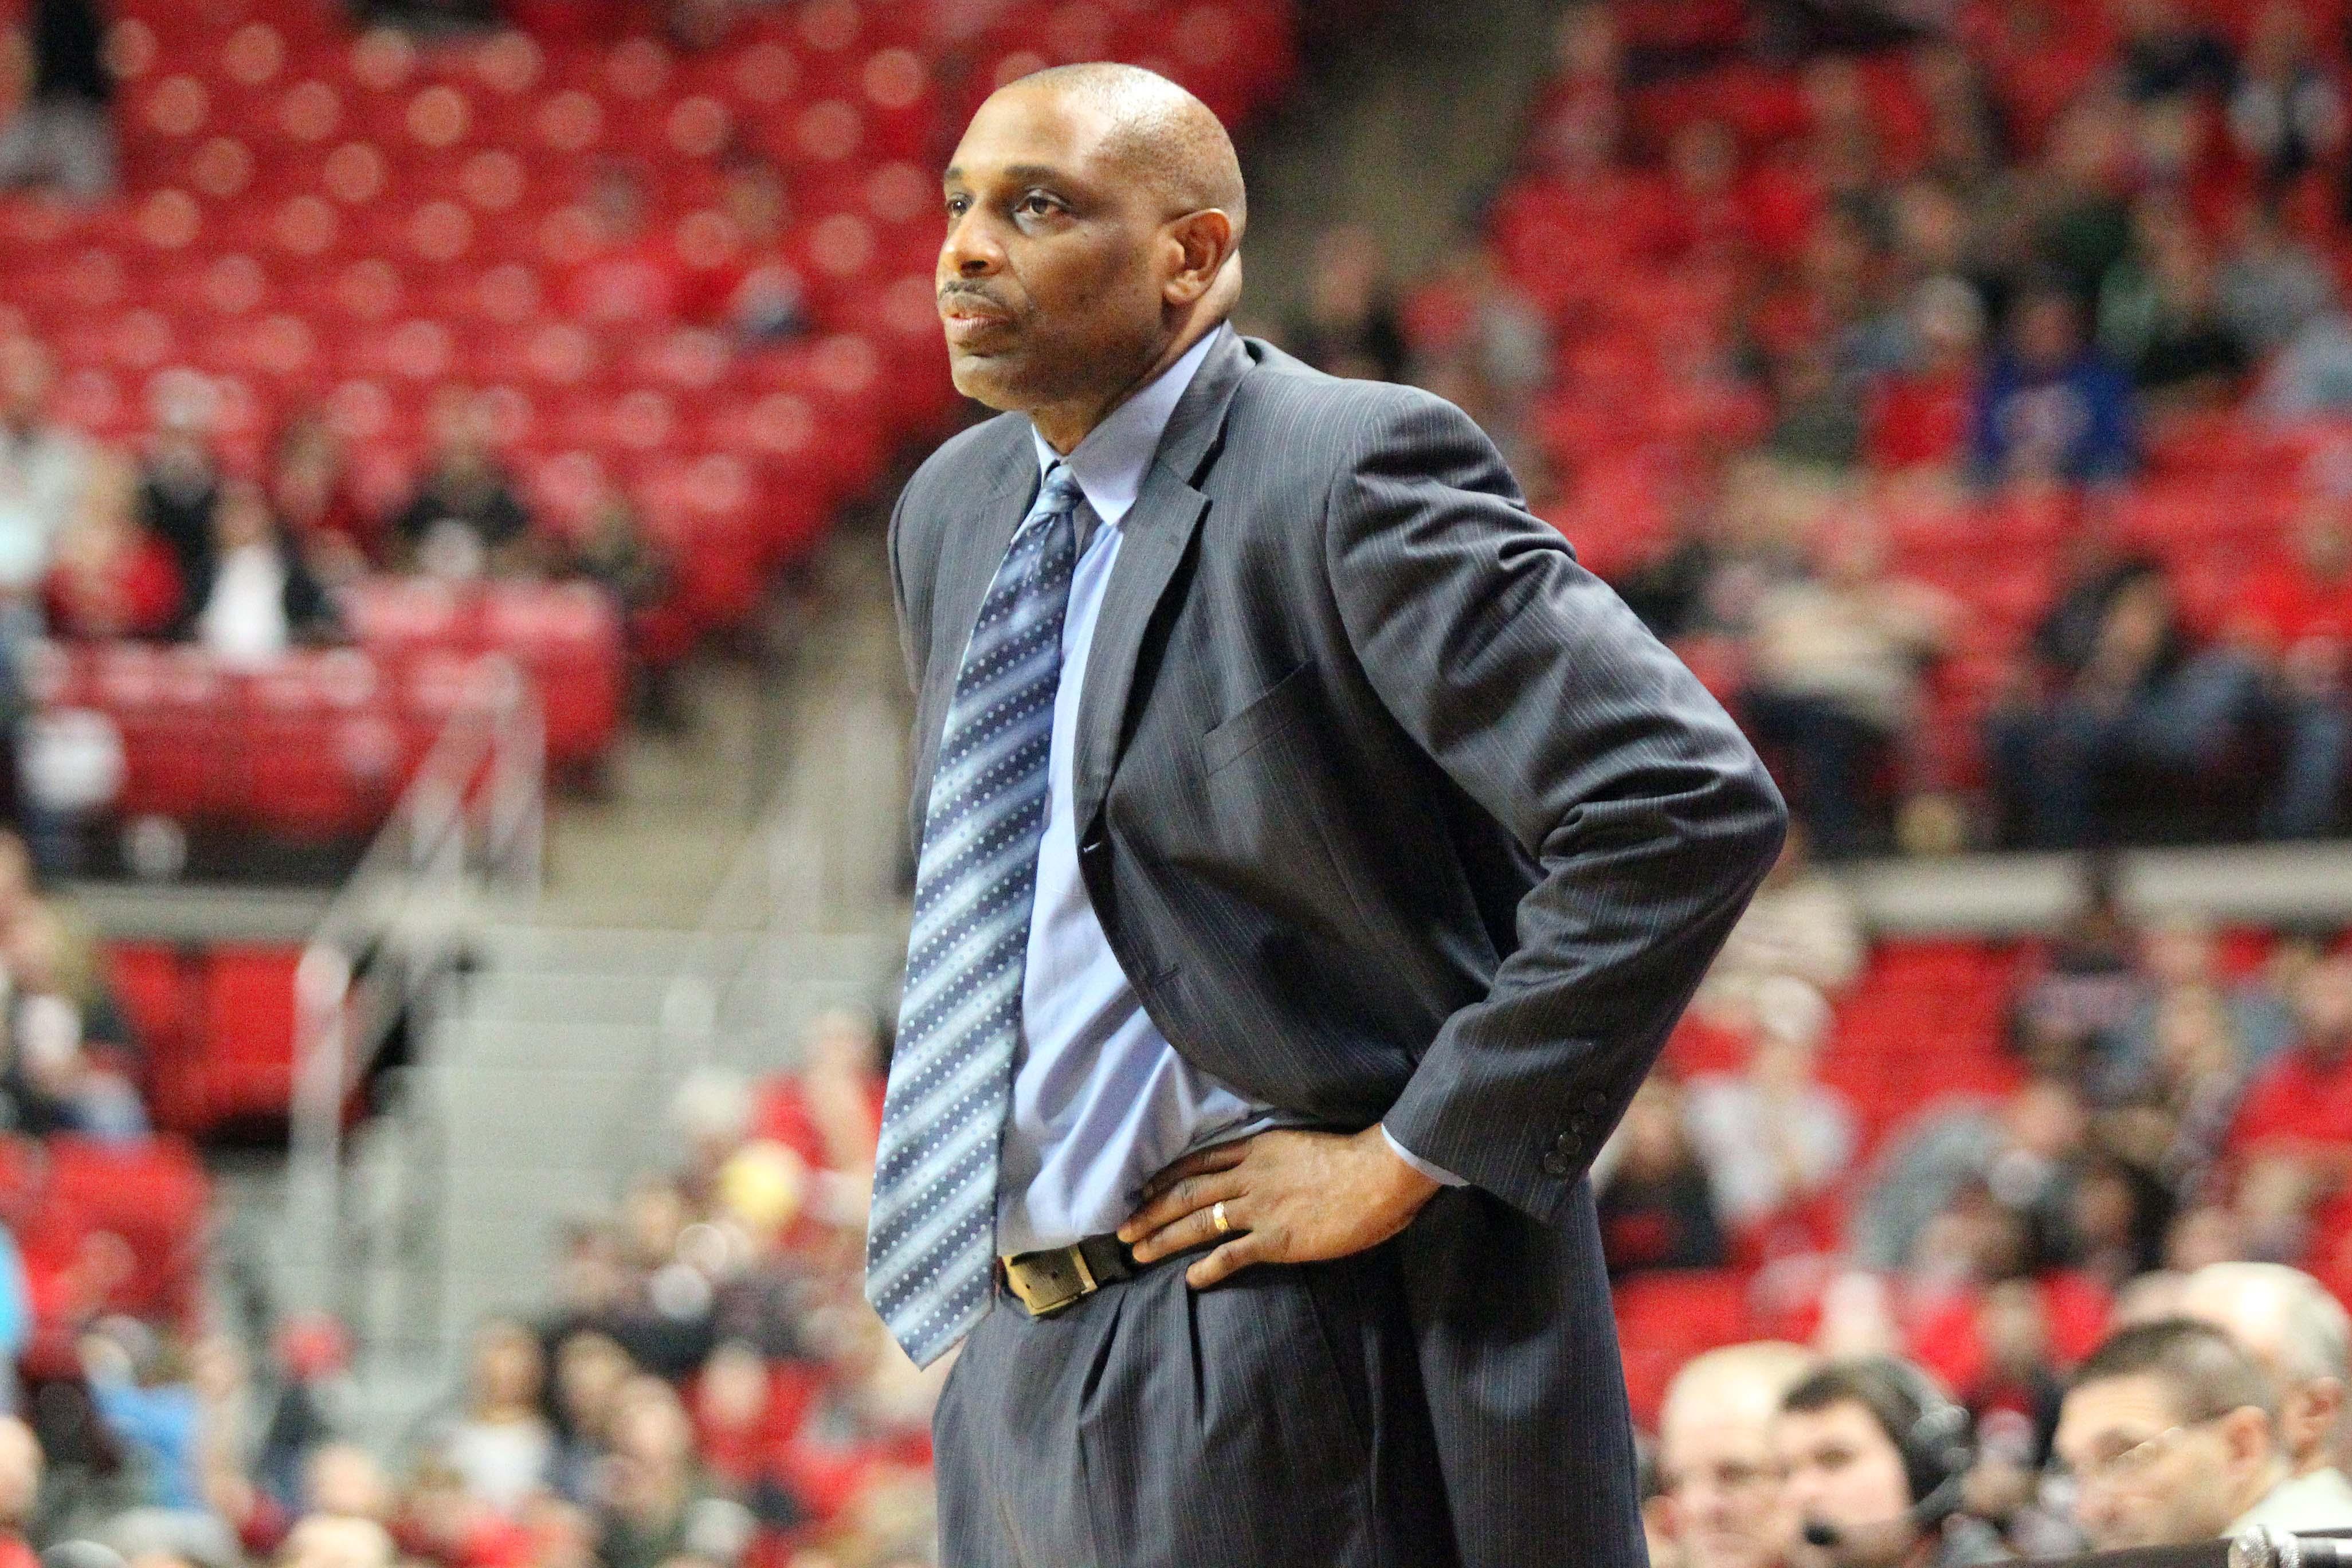 NCAA Basketball: Longwood at Texas Tech